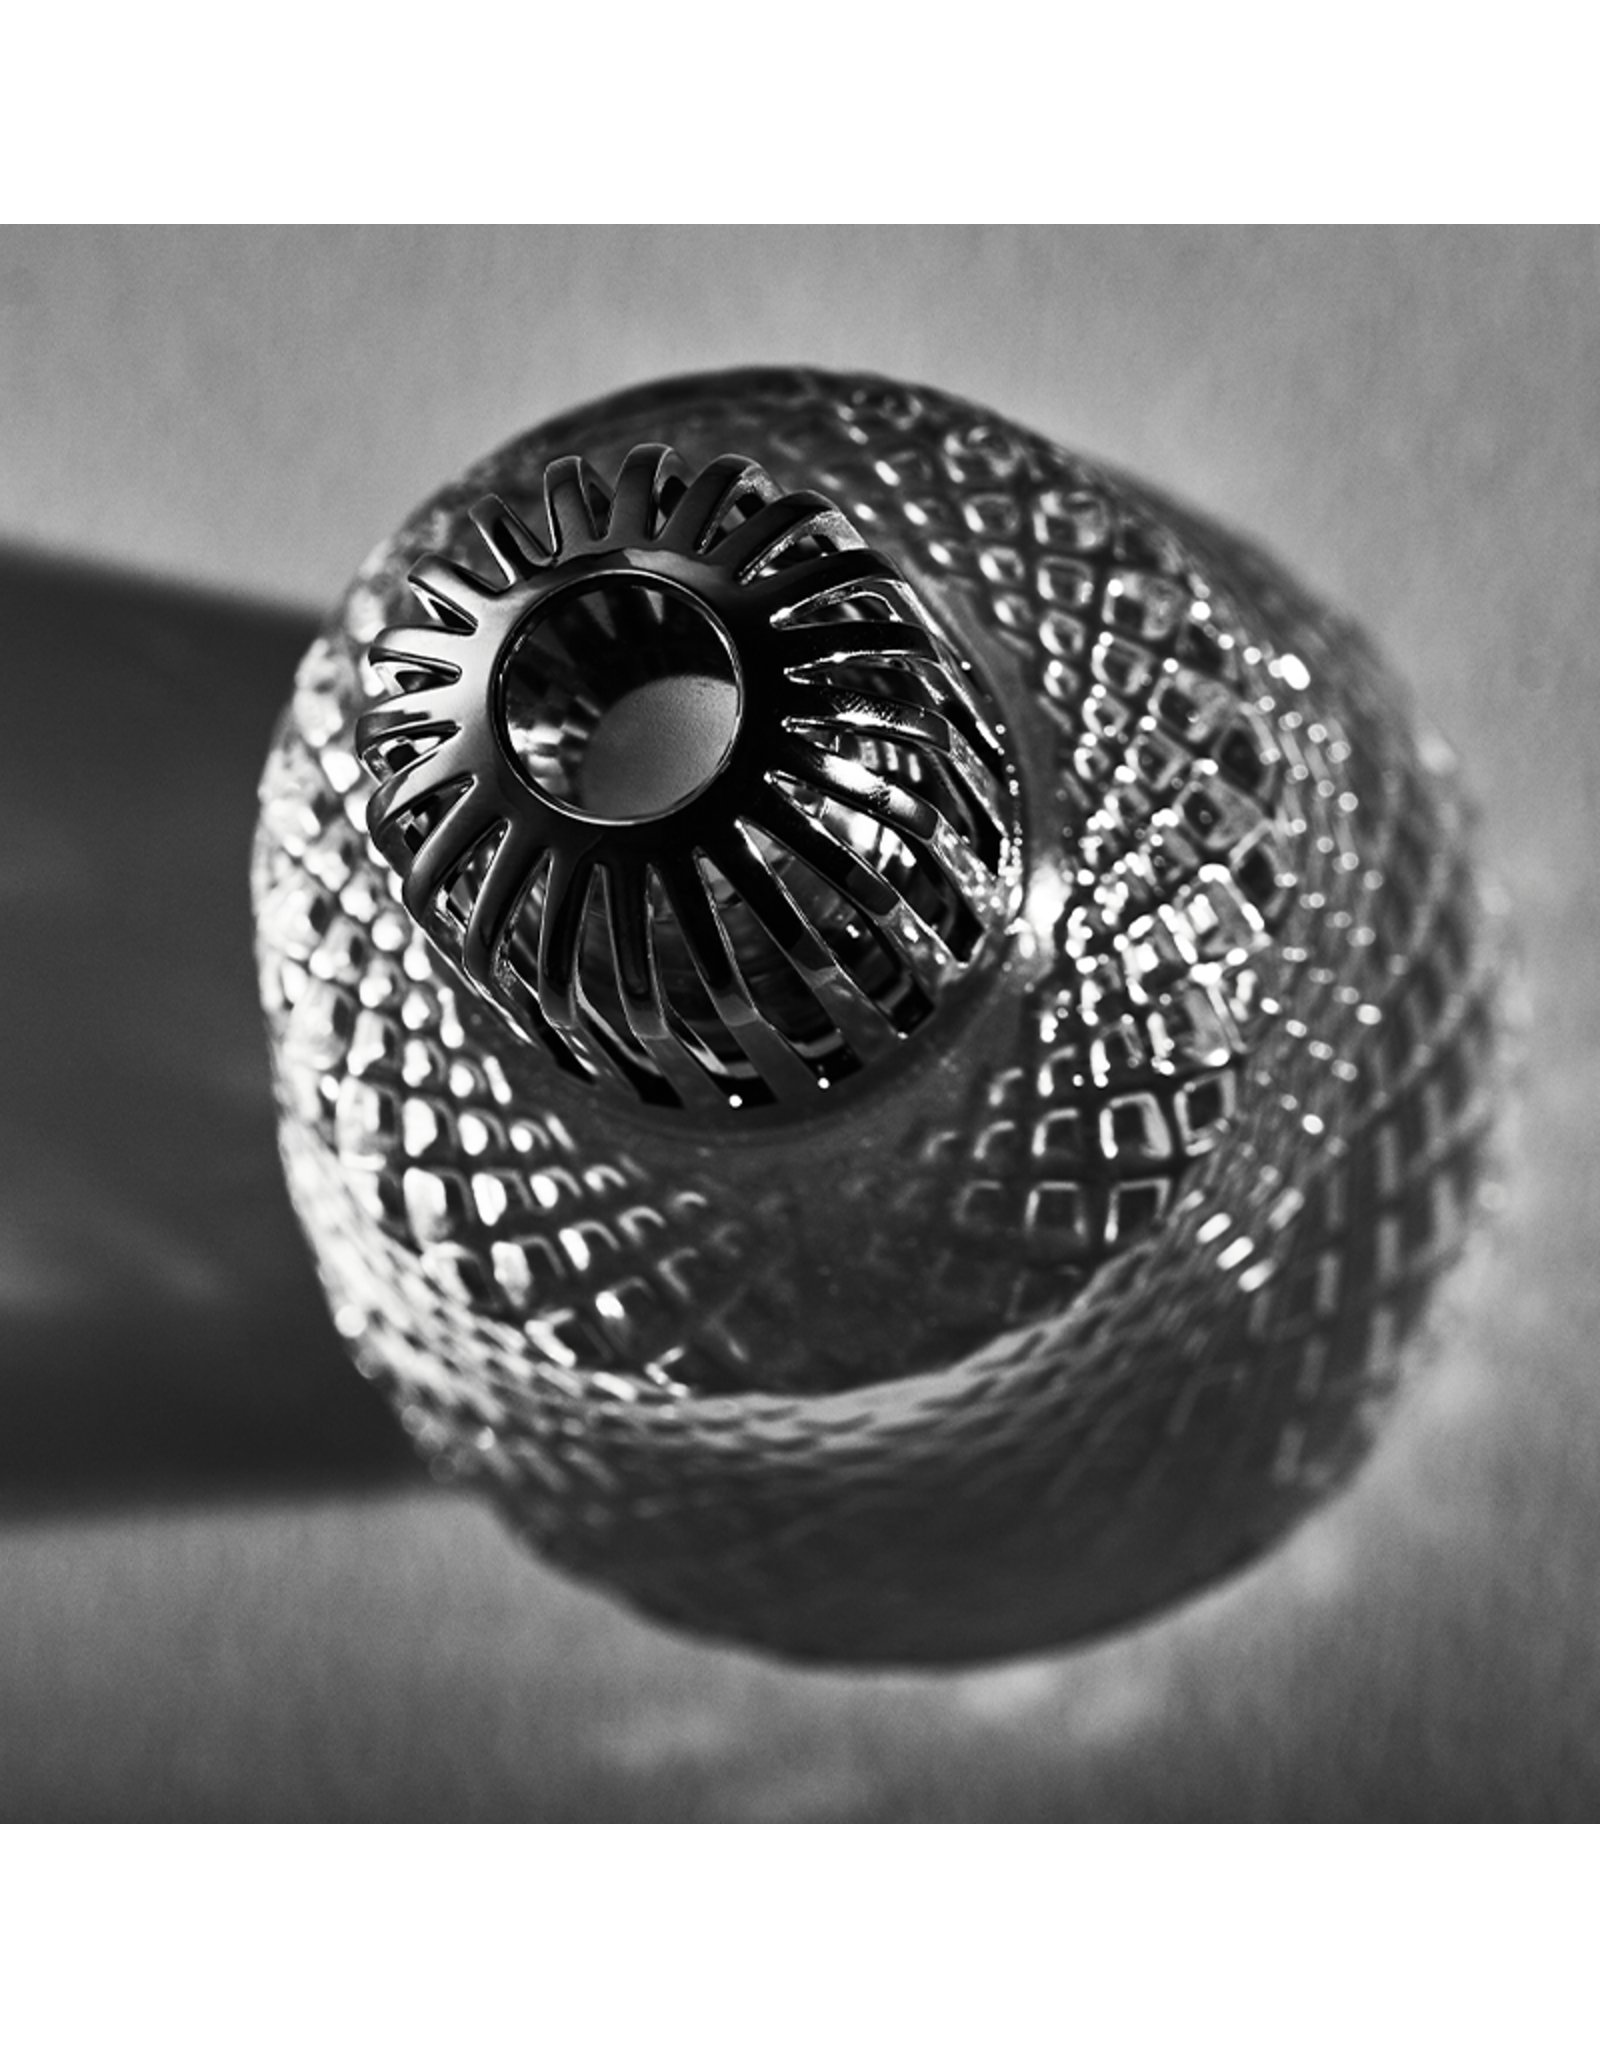 Lampe Berger Geurbrander Matali Crasset - Transparant